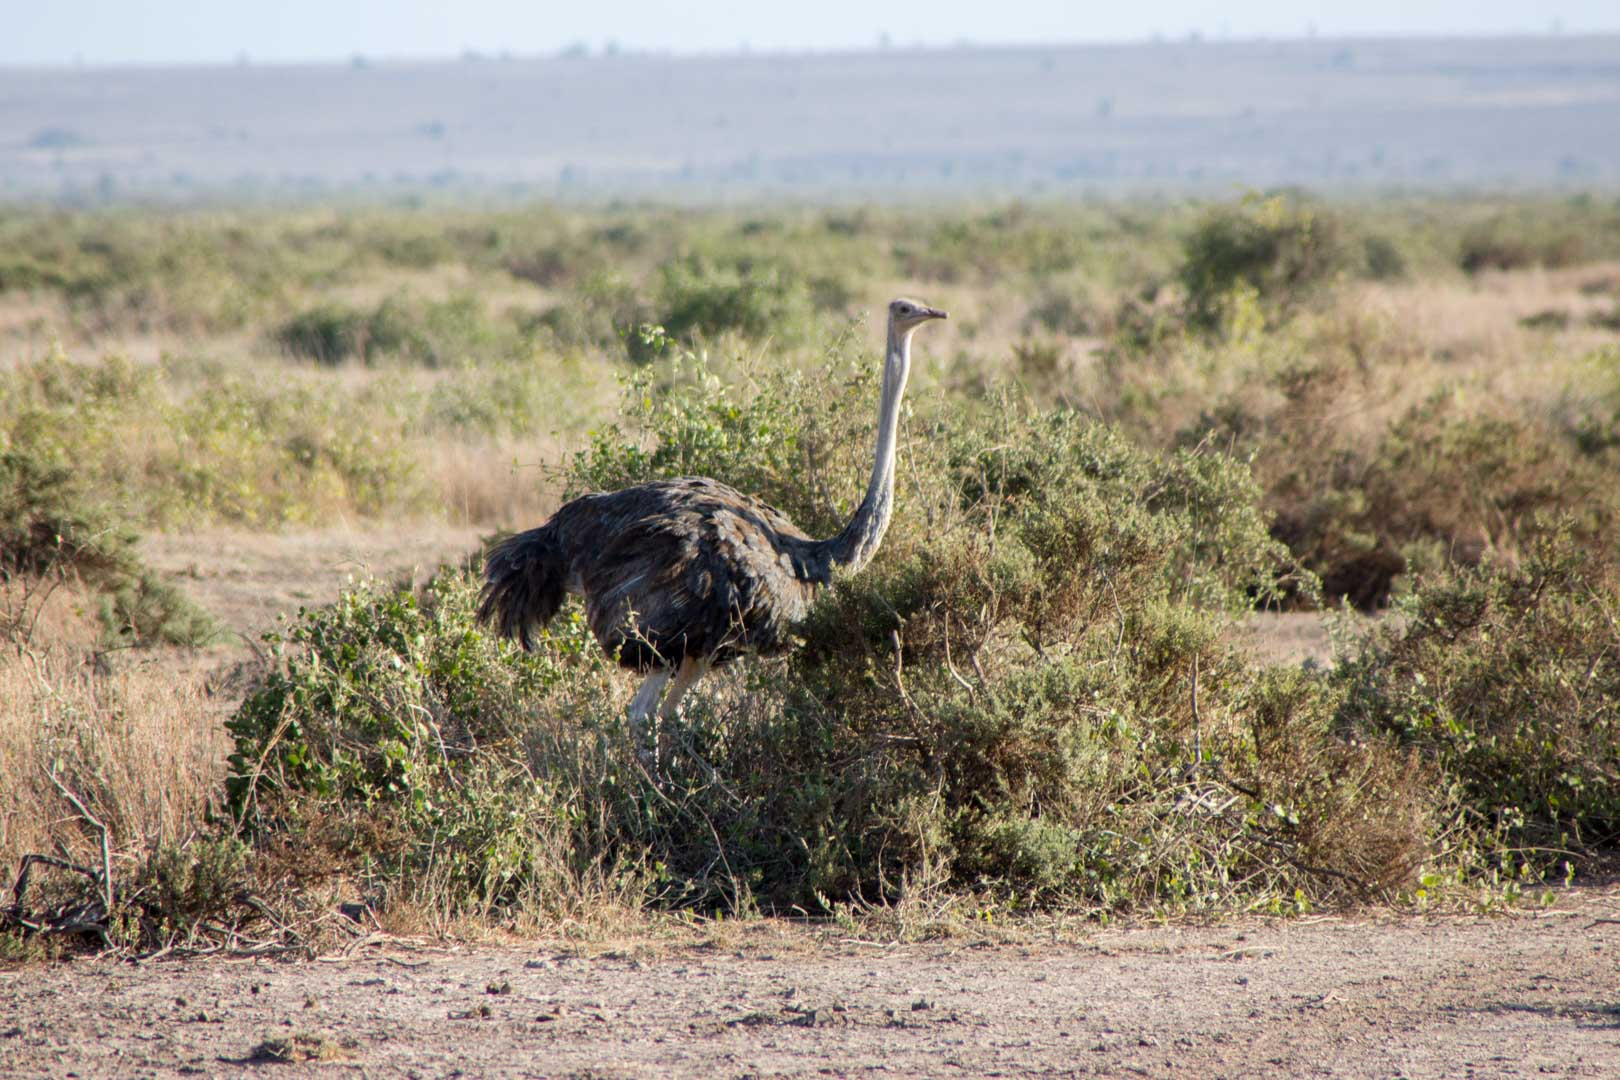 Avestruz en Amboseli, Kenia